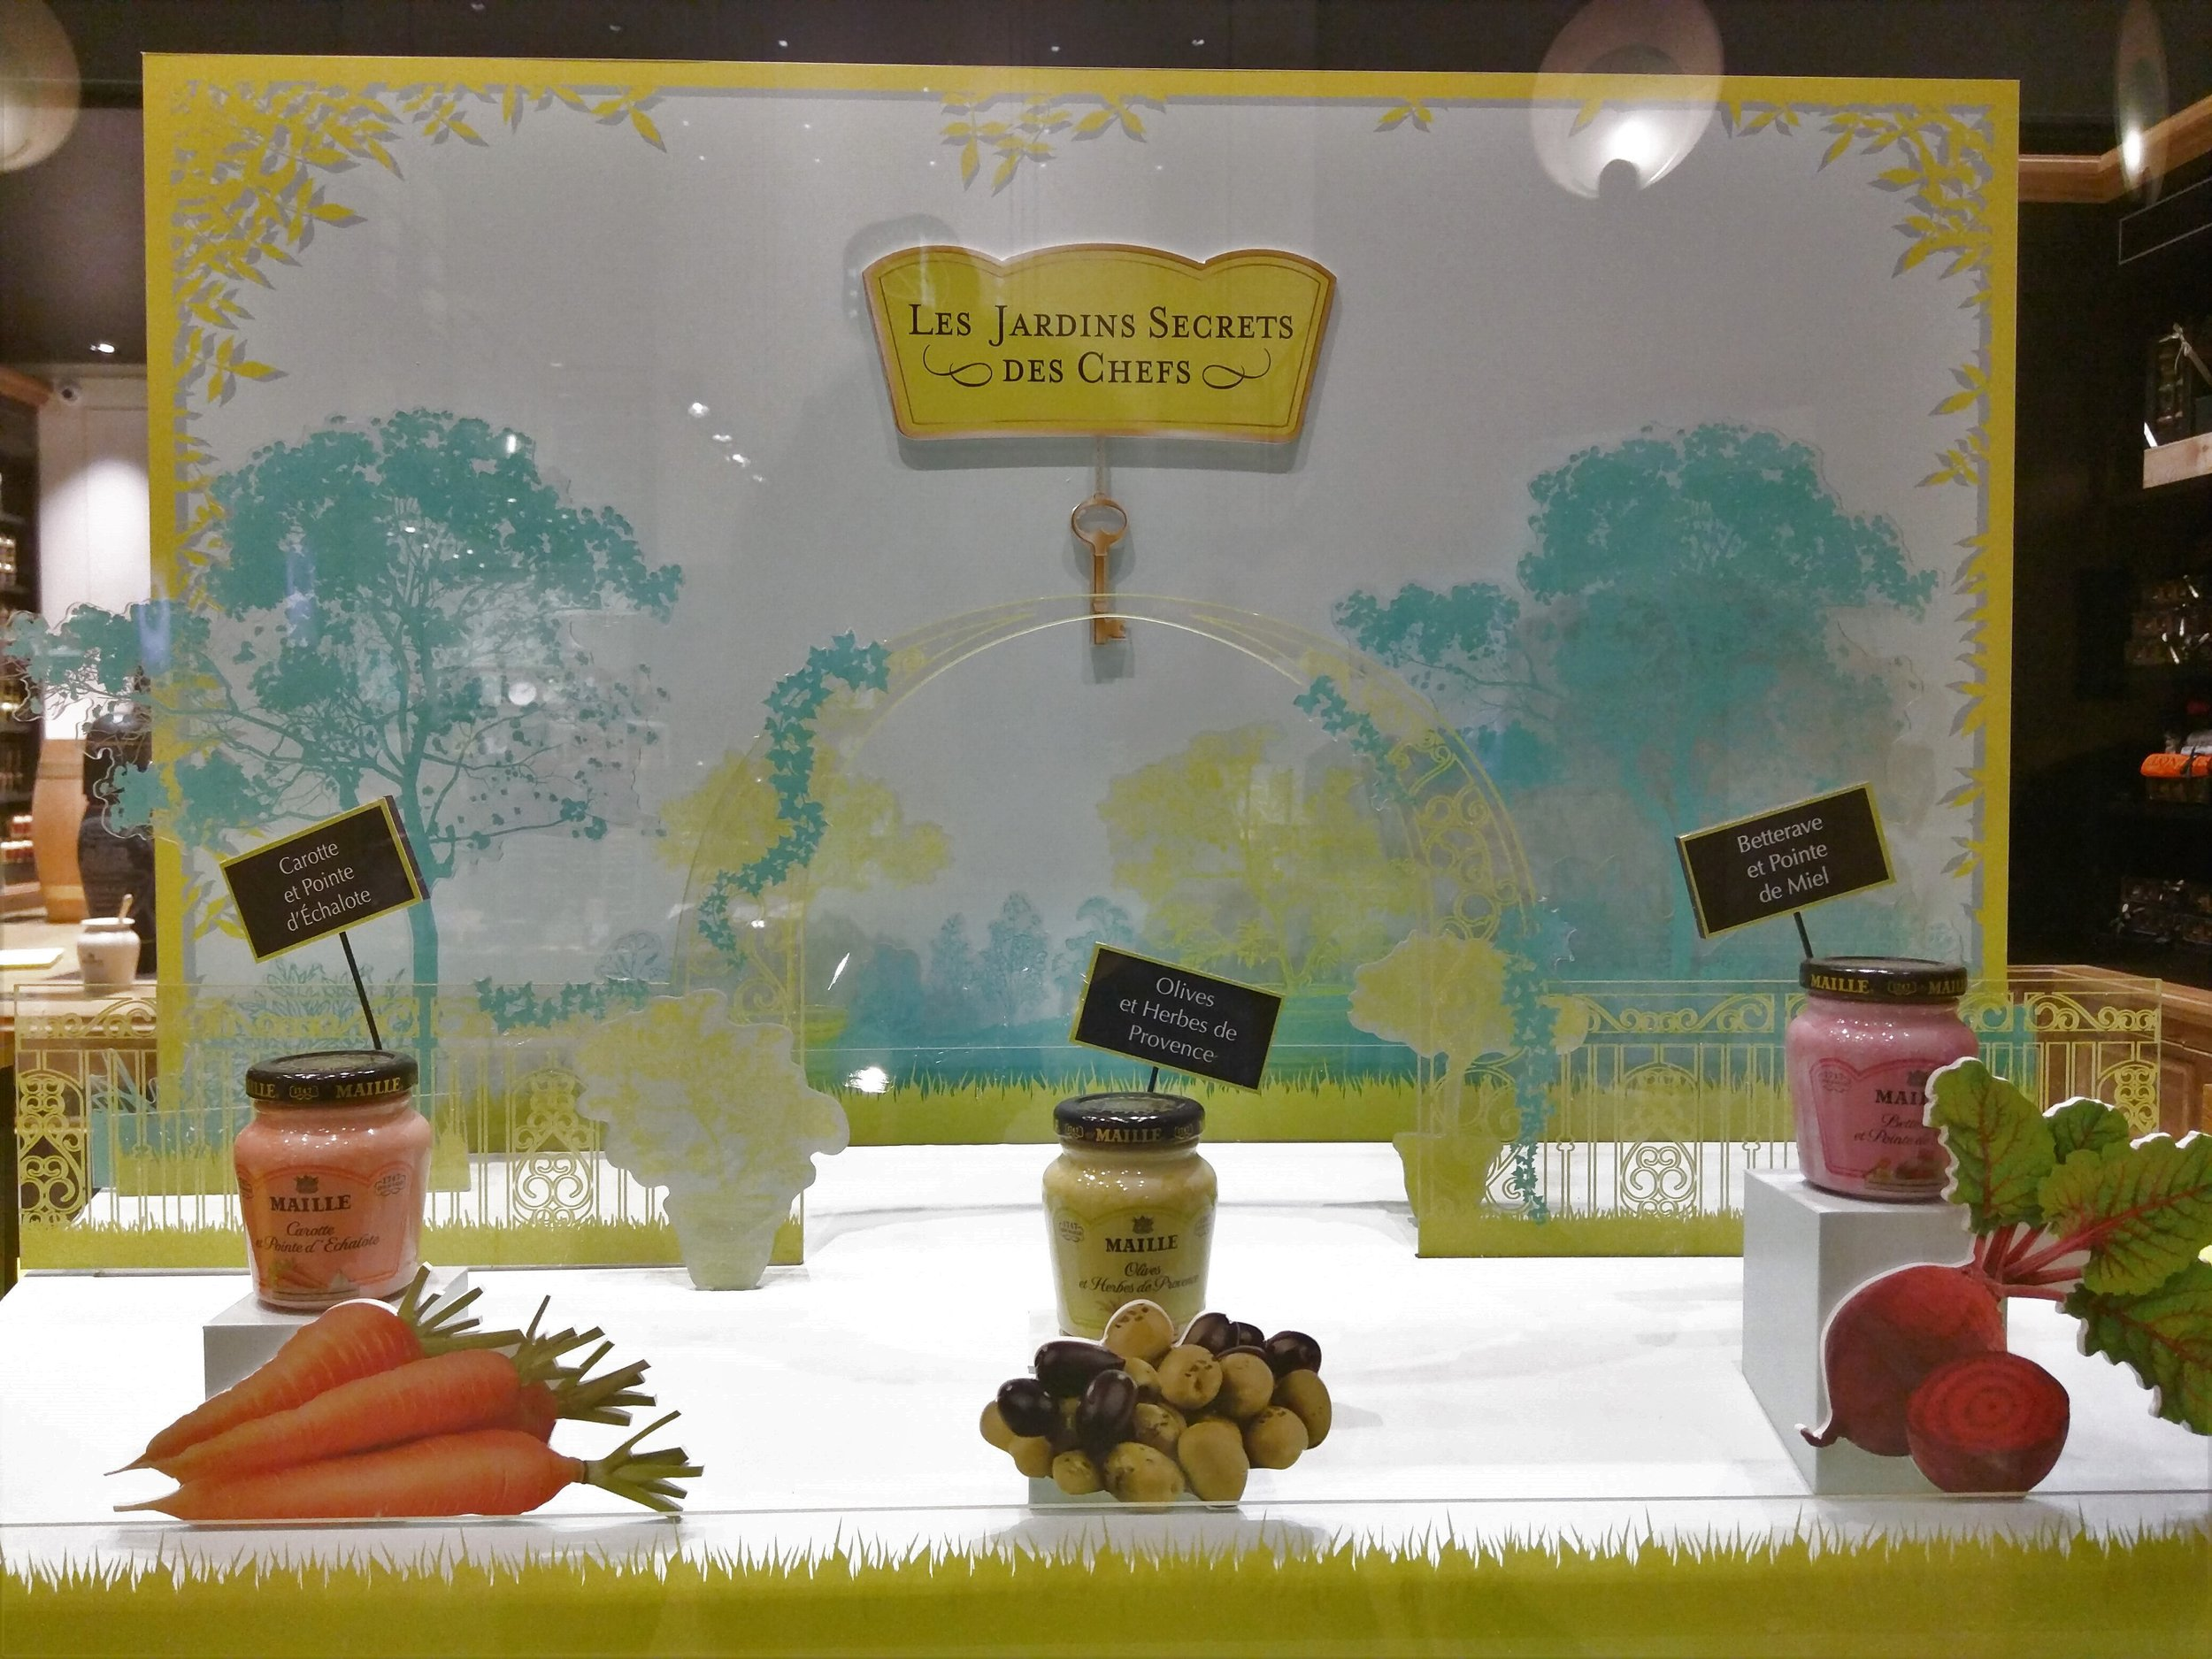 maille mustard window display.jpg